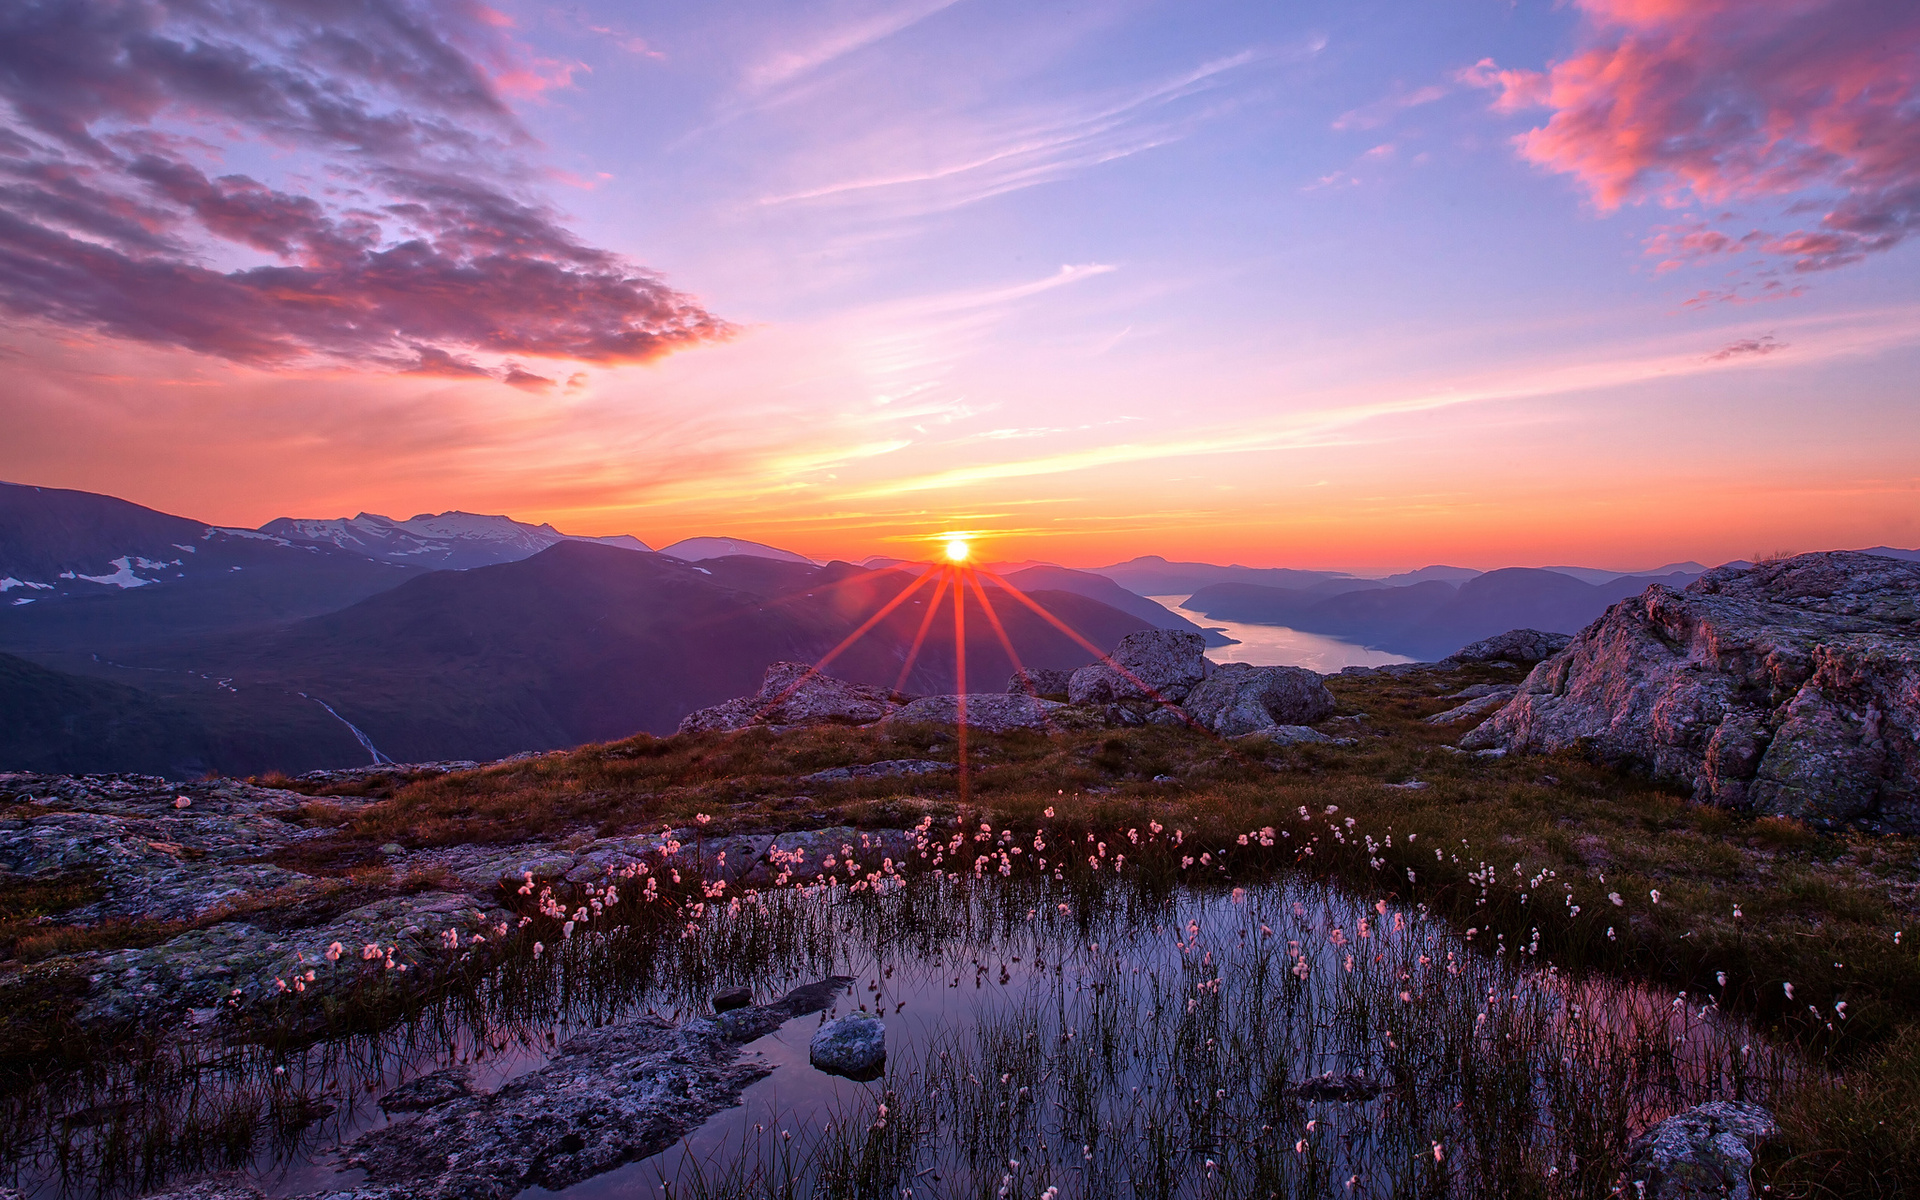 nature landscapes sunset sunrise pond plants water flowers mountains 1920x1200